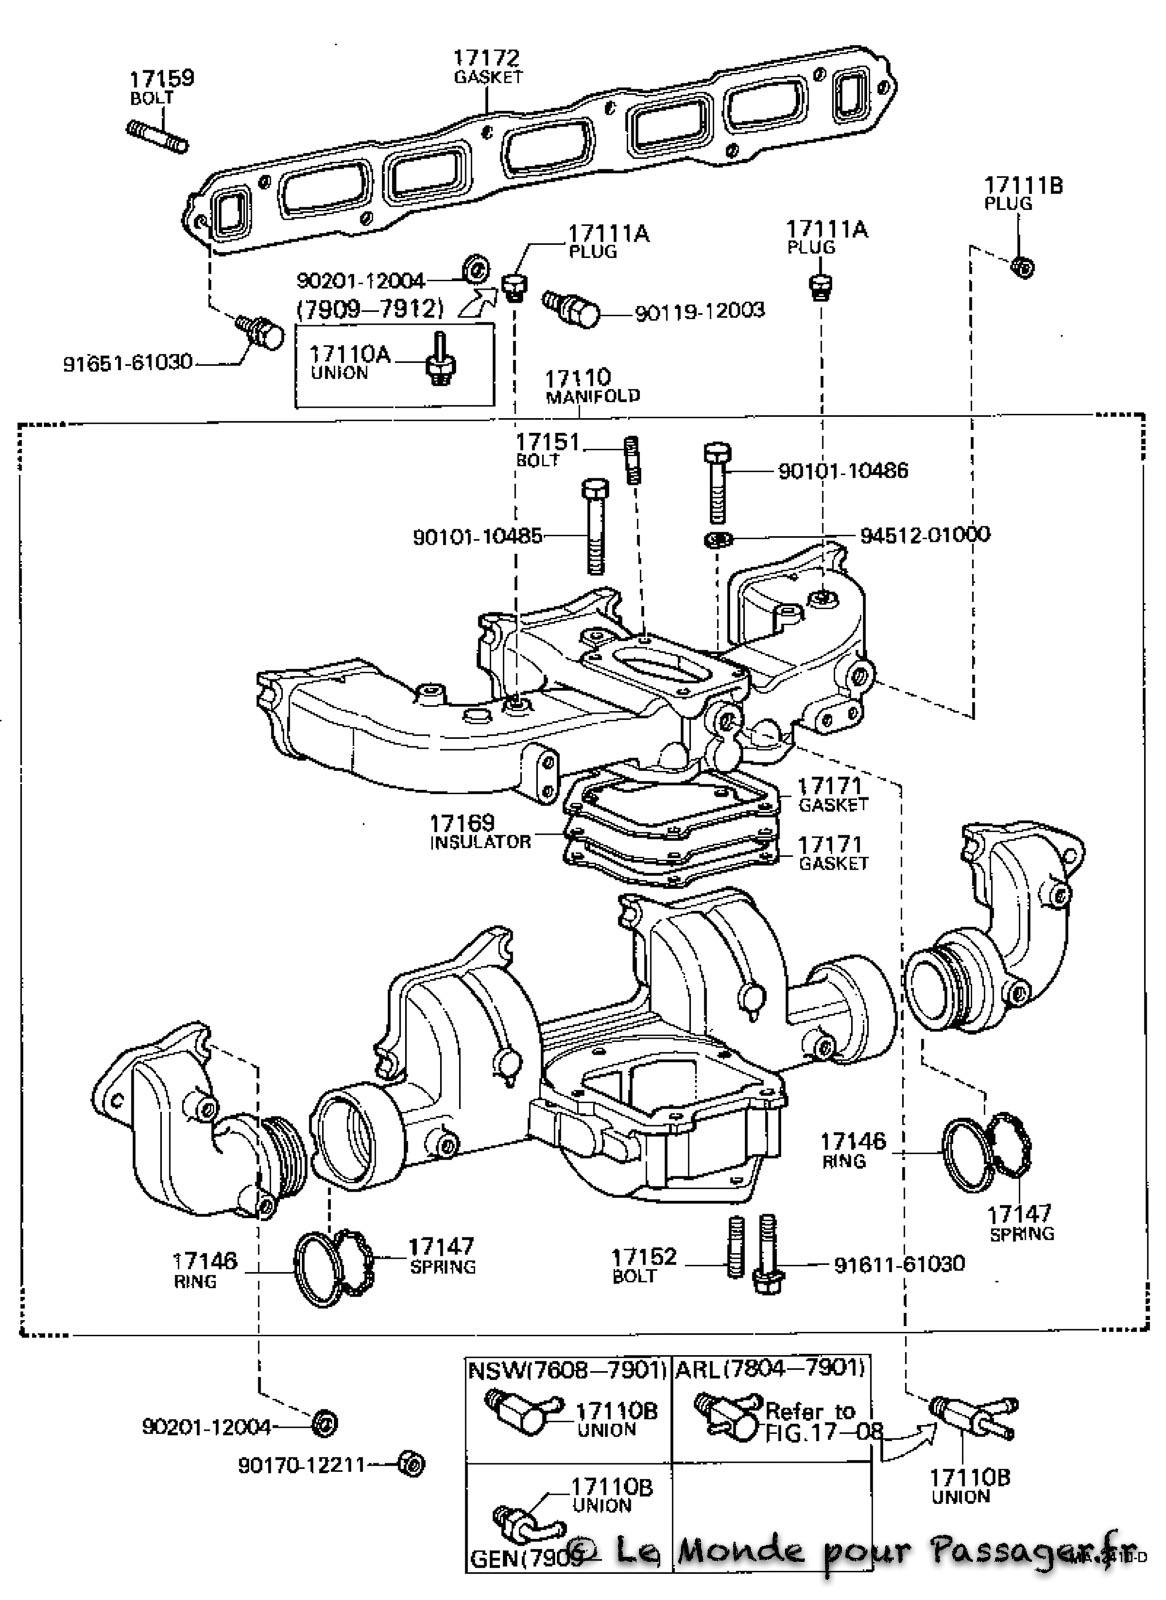 Fj55-Eclatés-Techniques072